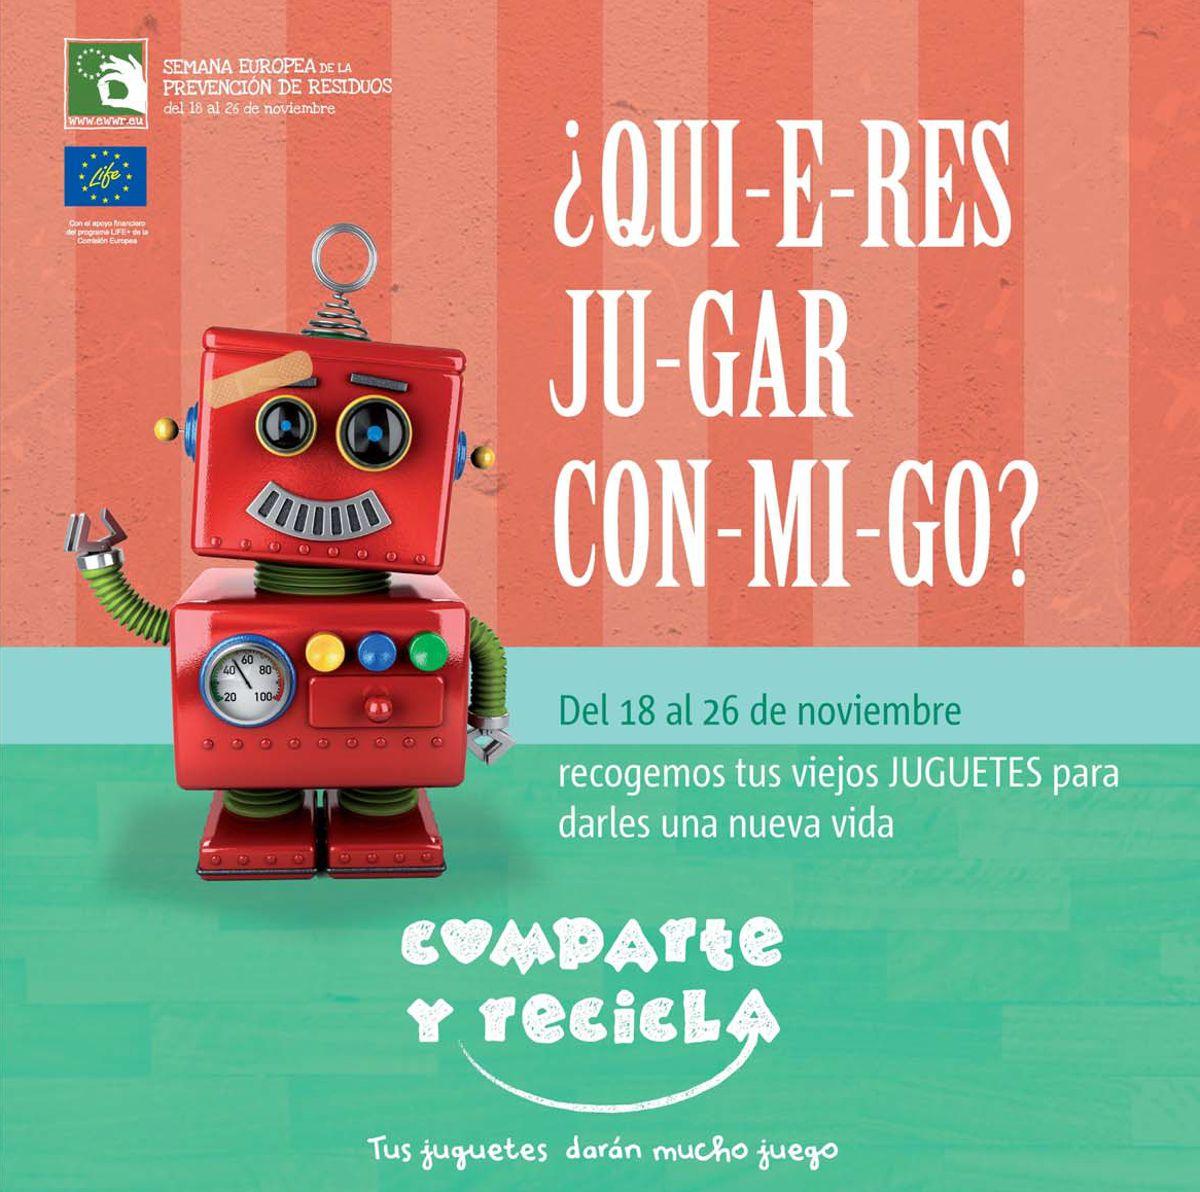 Web_Cartel_Campaña_Recogida_Juguetes_Aytos_v4